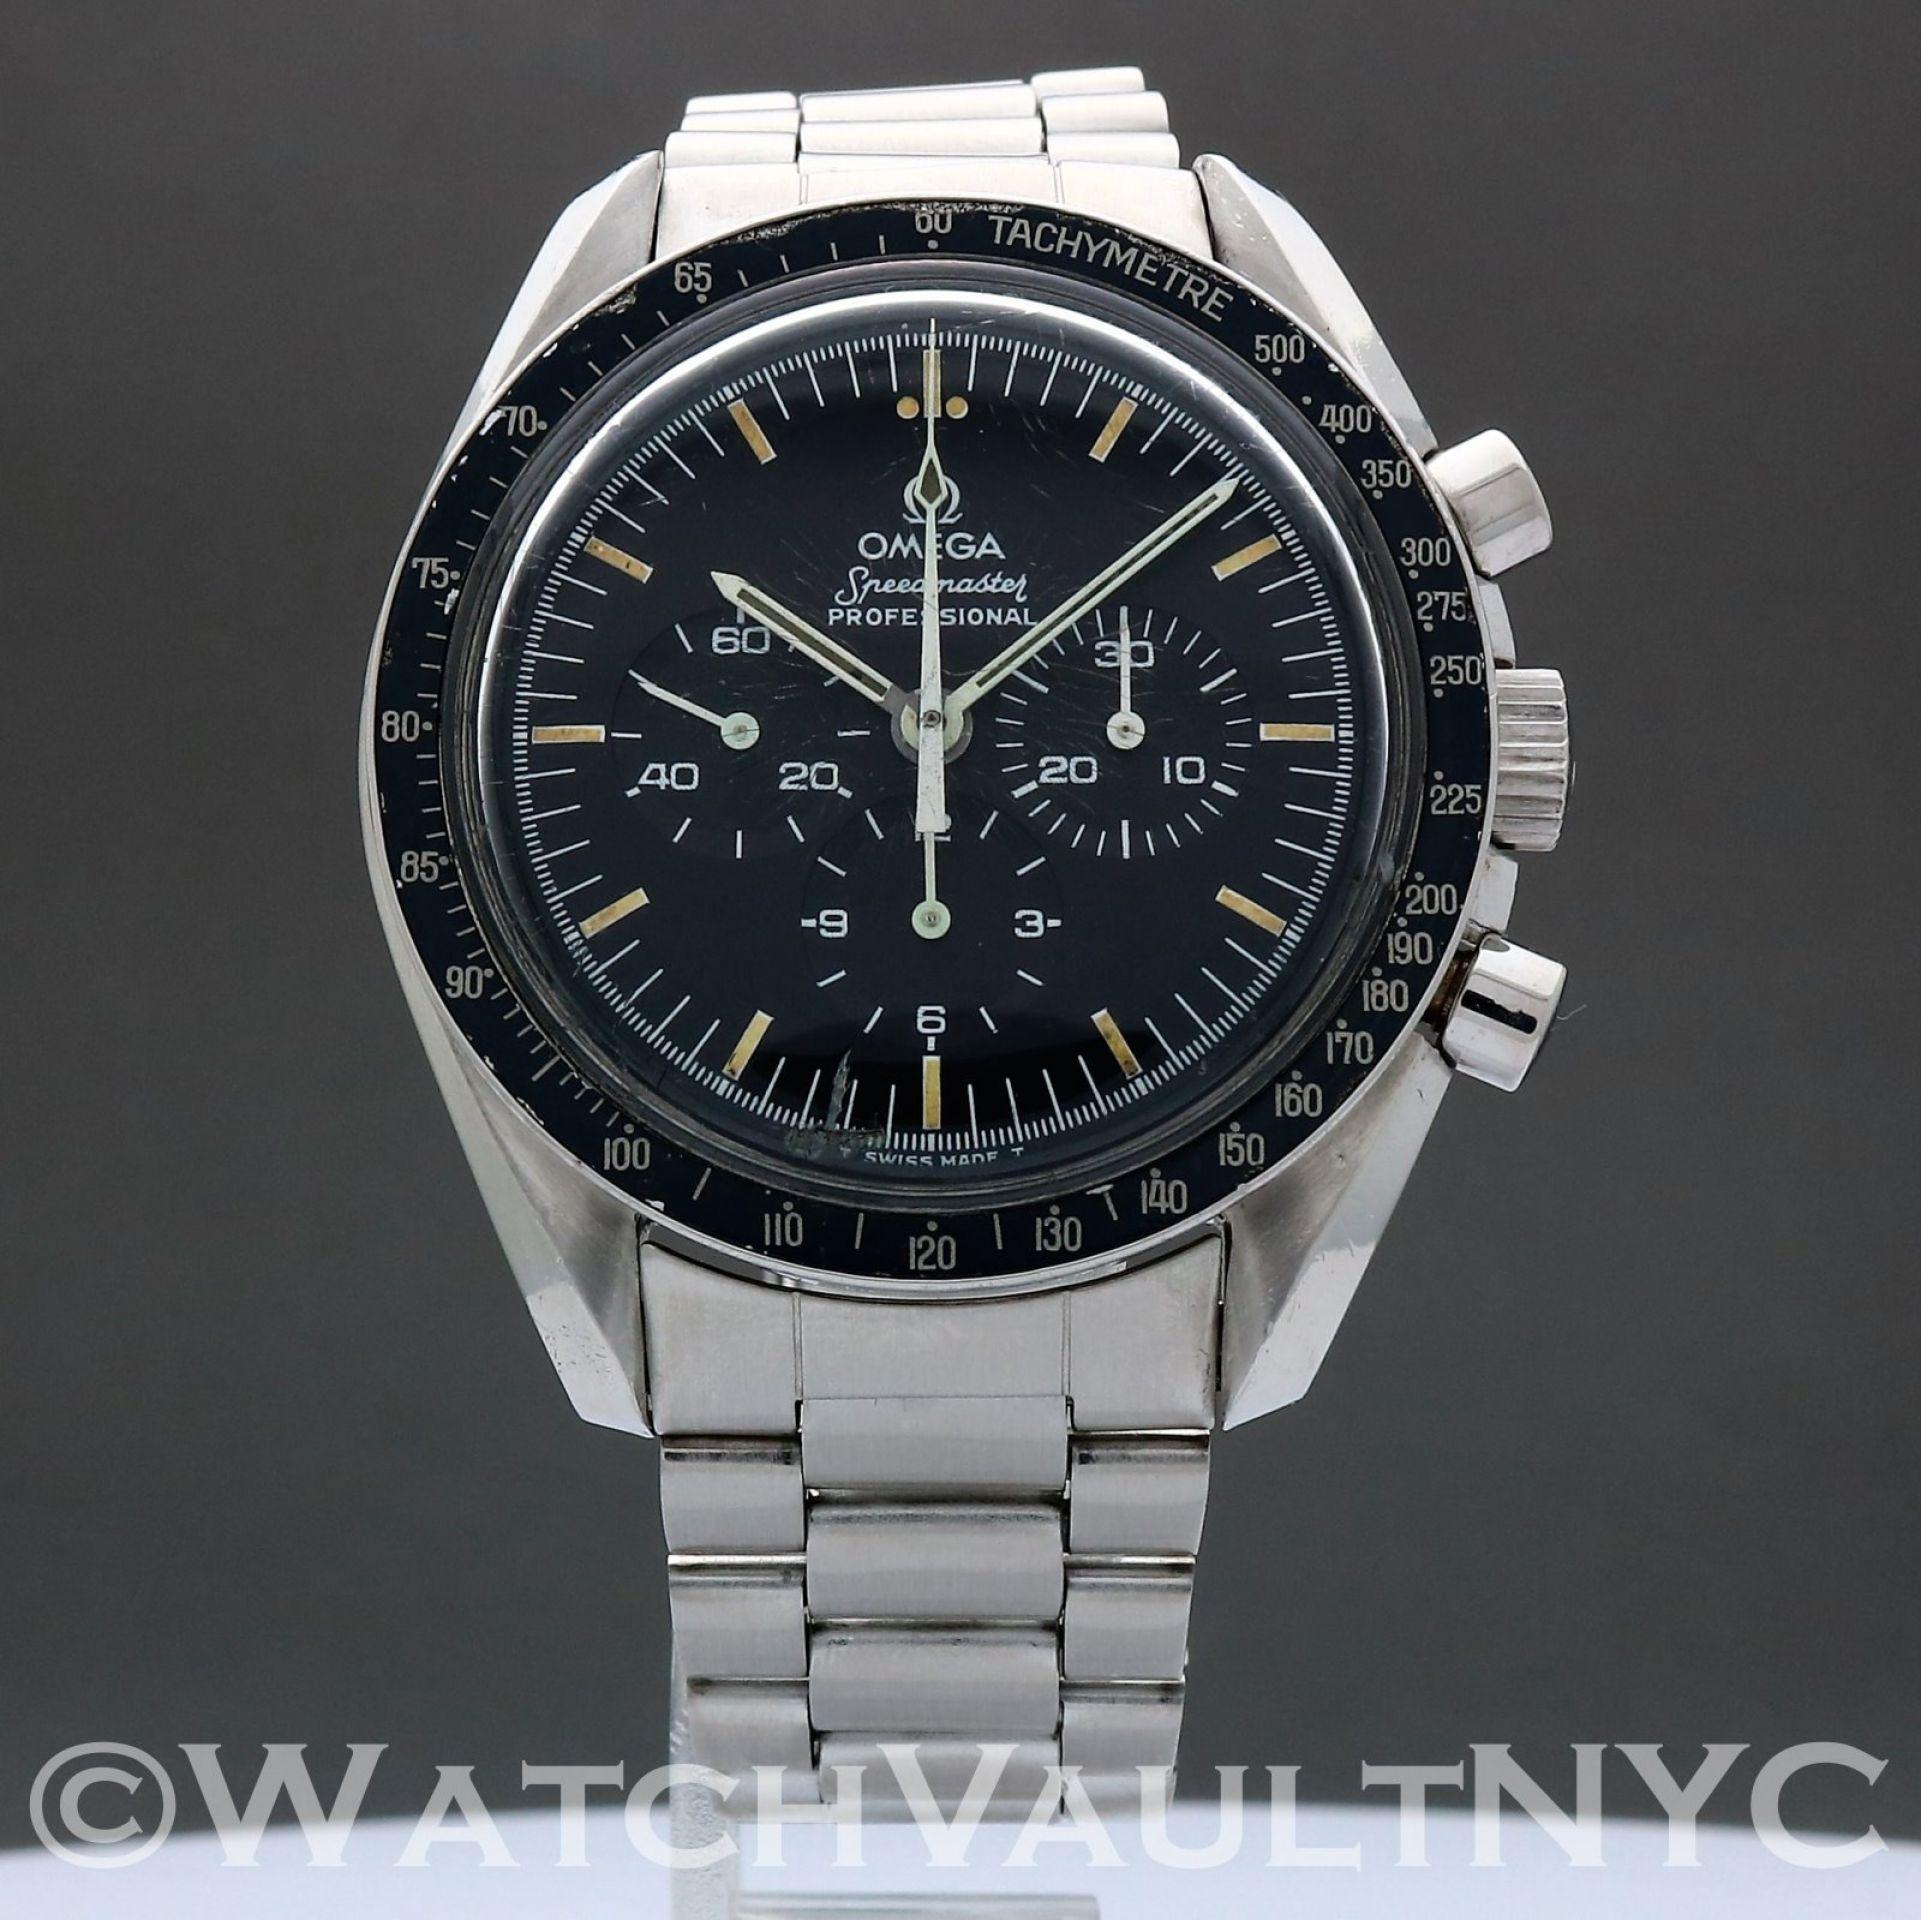 Omega Speedmaster Professional ST145.022-76 Moonwatch 1976 Vintage 42mm SC311